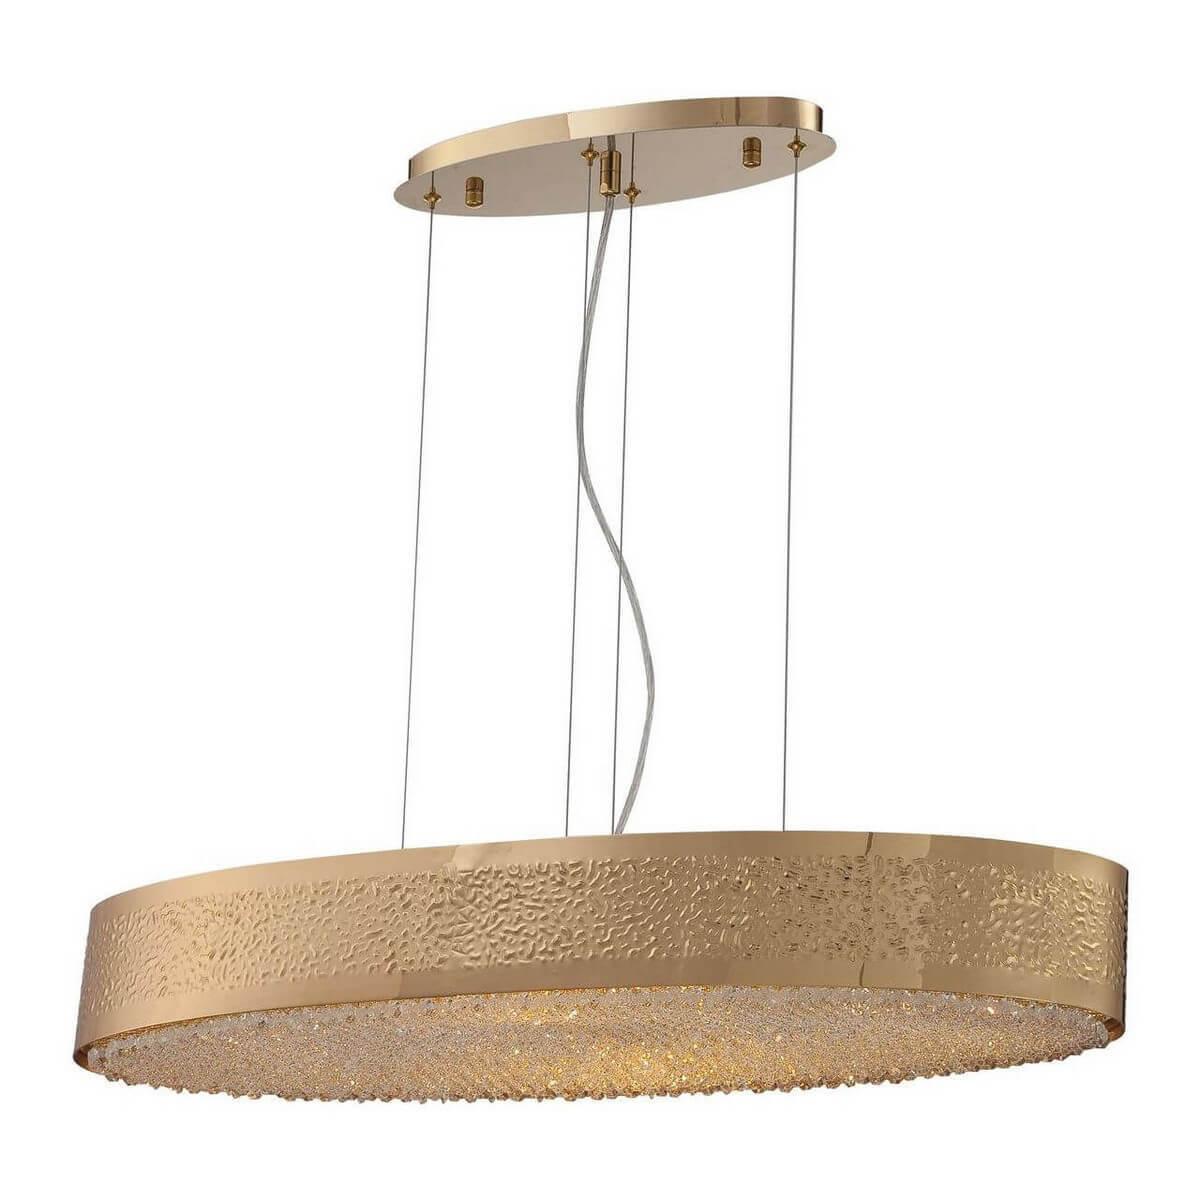 Подвесной светильник Lucia Tucci Fabian 1553.8 Gold abt tobias erath fabian power of e motion